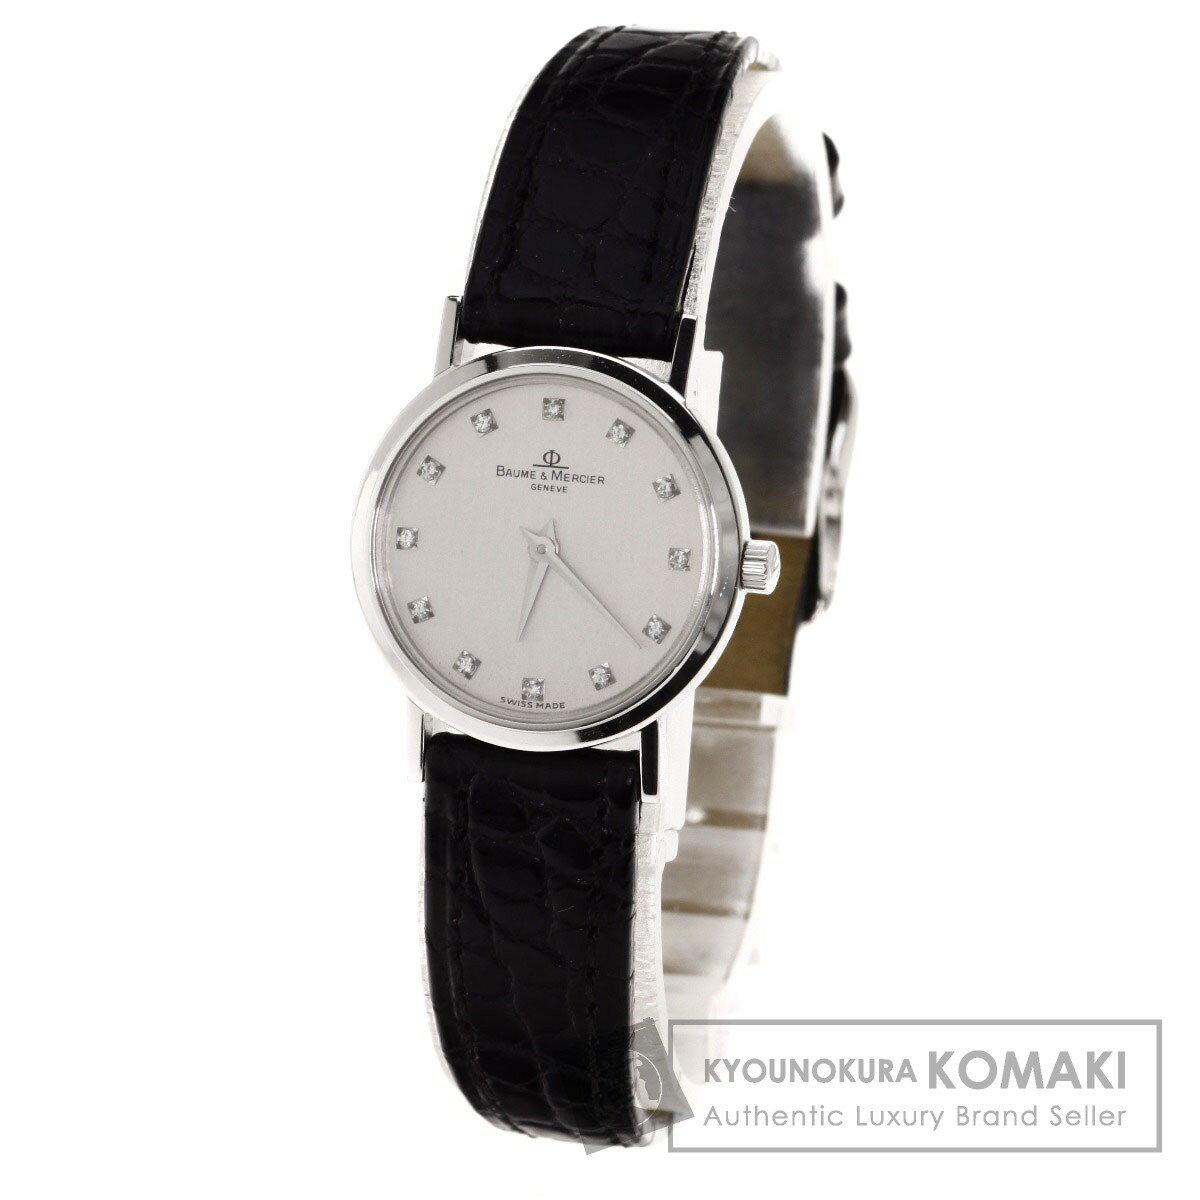 Baume & Mercier 12Pダイヤモンド 腕時計 OH済 K18ホワイトゴールド/革/クロコダイル レディース 【中古】【ボーム&メルシェ】